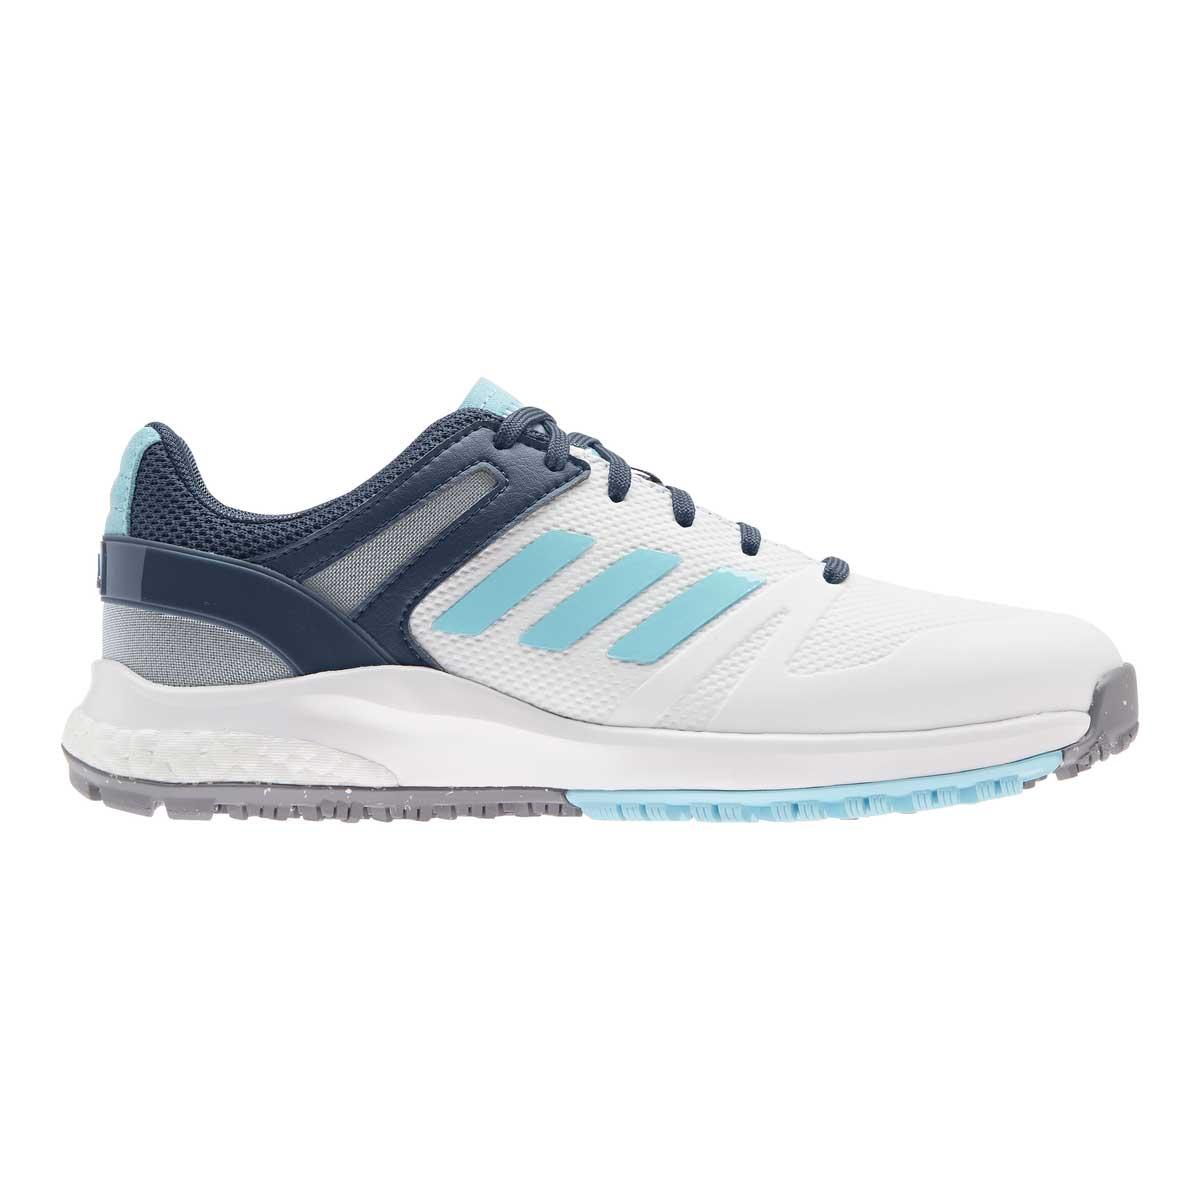 Adidas Women's EQT White/Hazy Sky Spikeless Golf Shoe